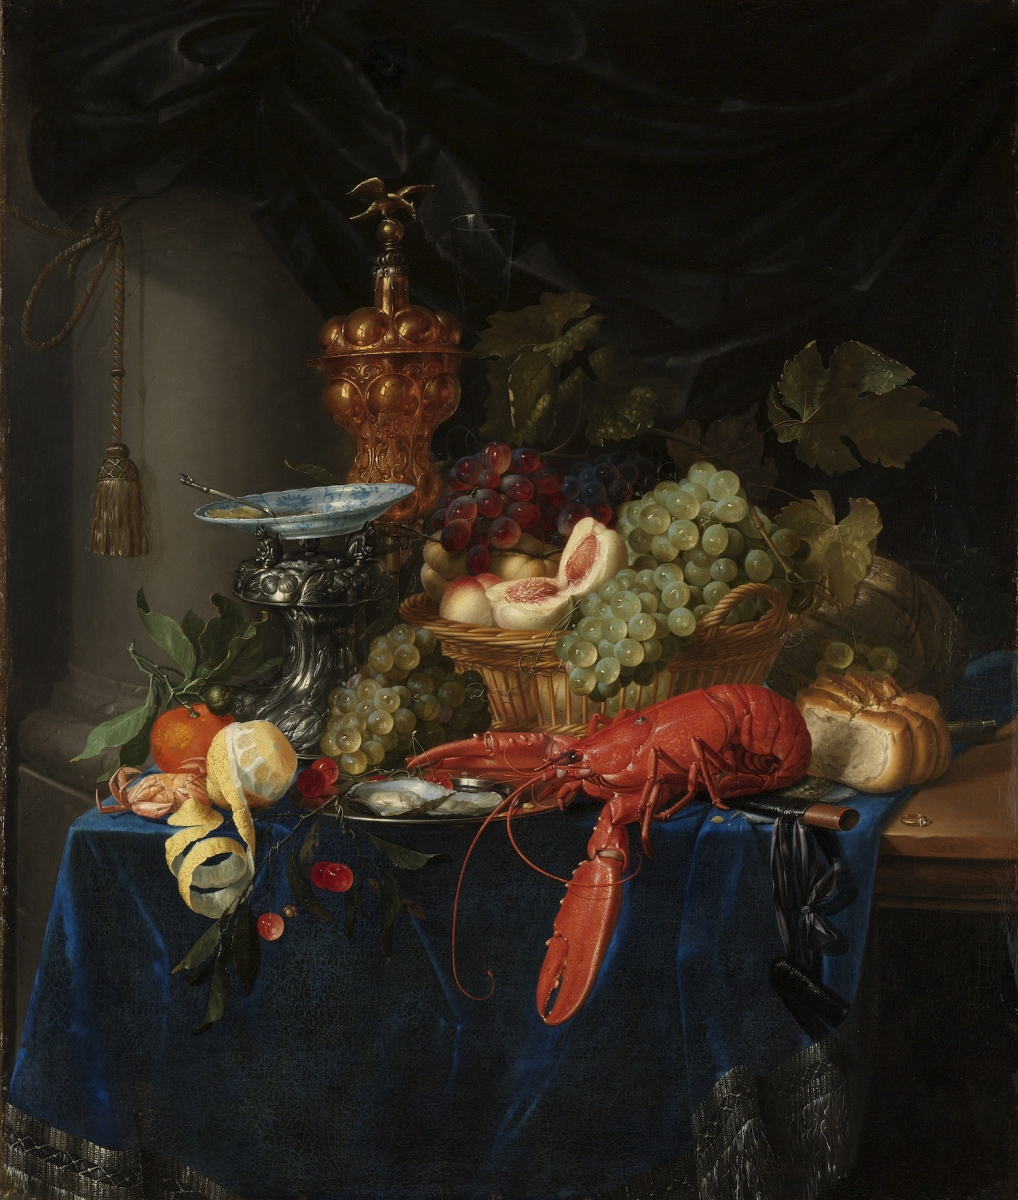 Rembrandt, Dutch Golden Age